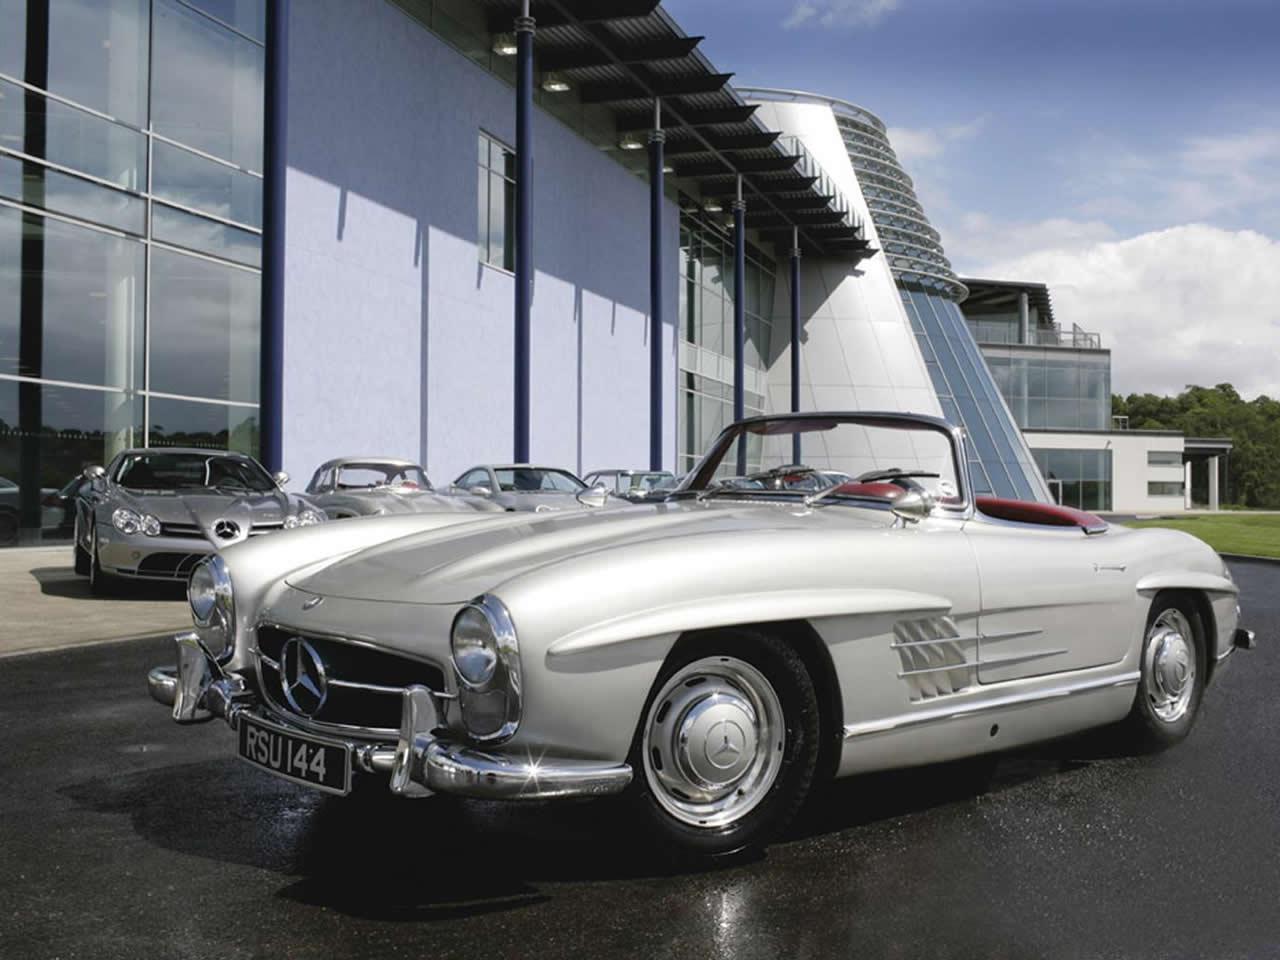 Old Mercedes Benz Convertible Car Wallpapers Wallpaper Cave